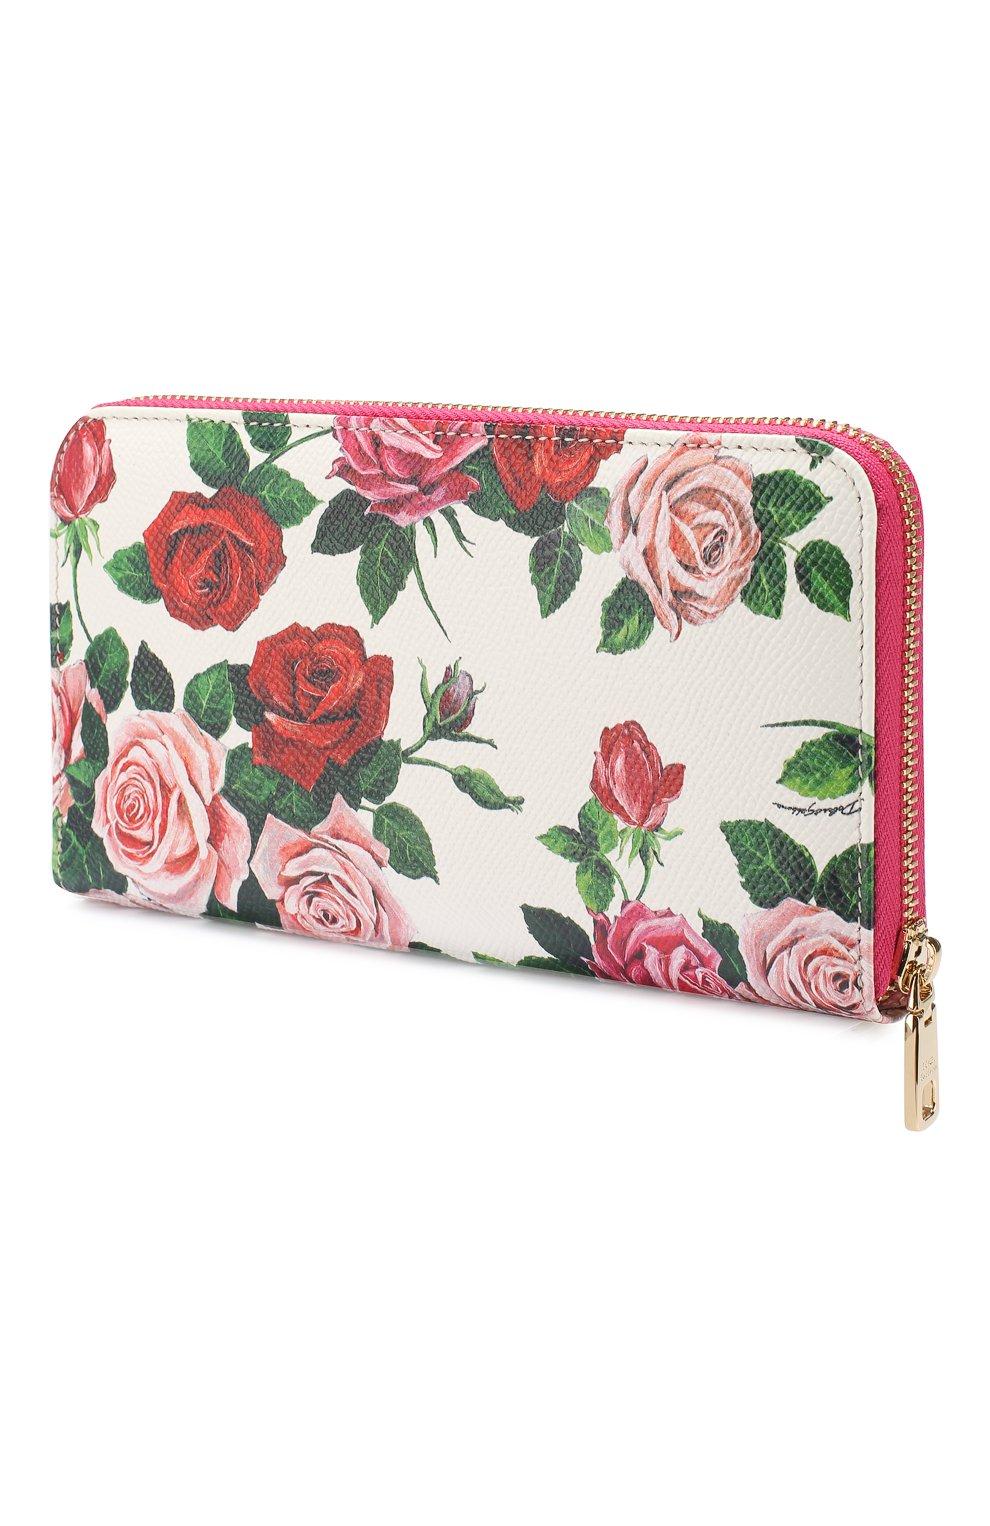 Кожаное портмоне Dolce & Gabbana разноцветного цвета | Фото №2